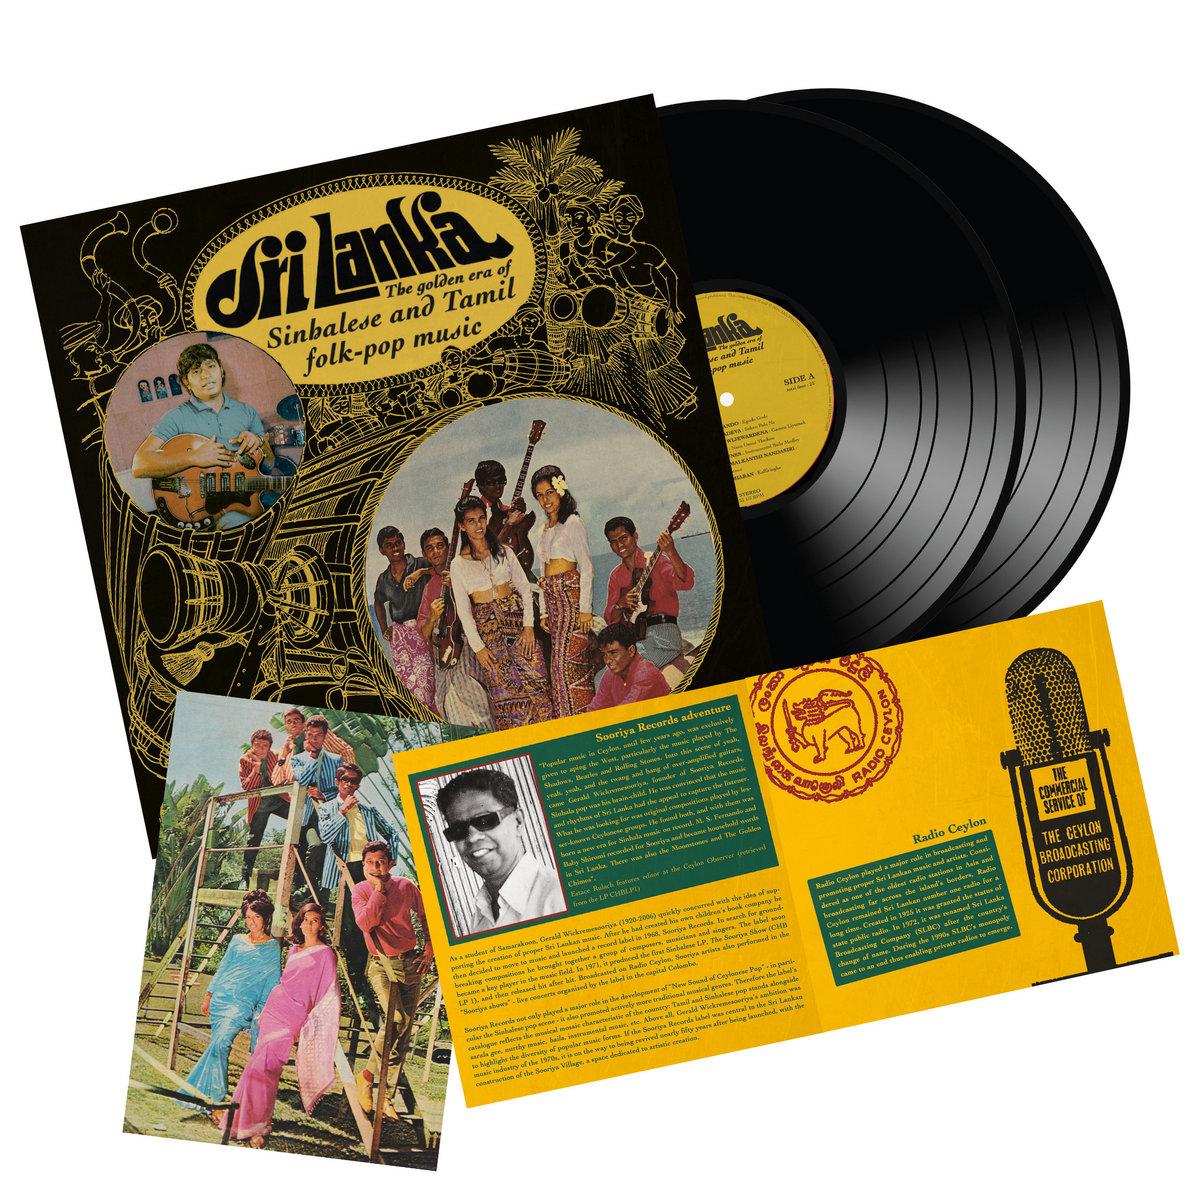 Sri Lanka The Golden Era Of Sinhalese Tamil Folk Pop Music